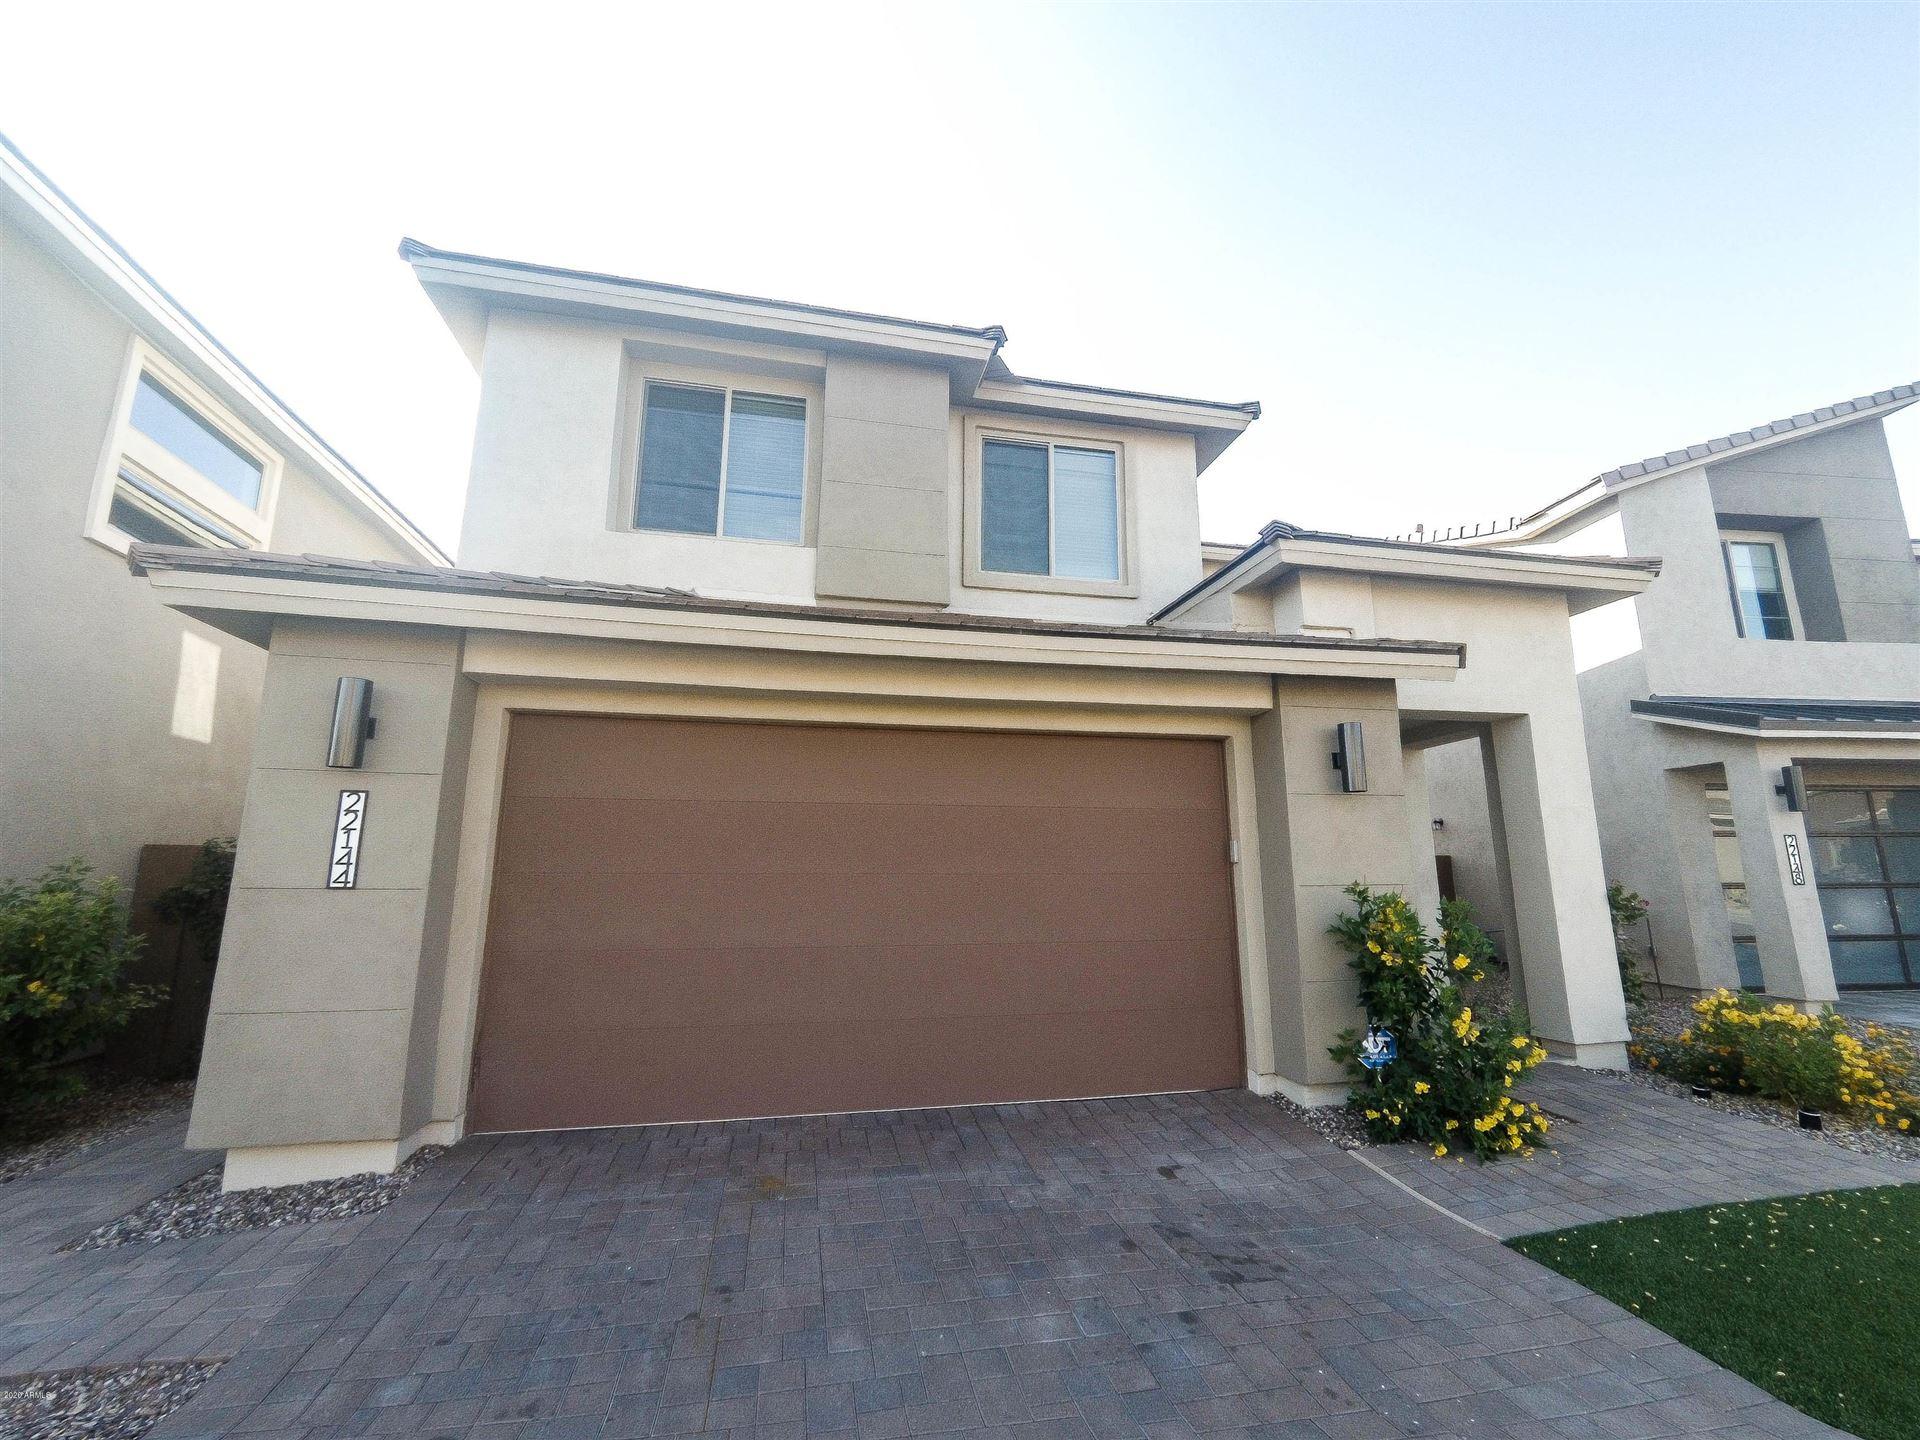 22144 N 28TH Place, Phoenix, AZ 85050 - MLS#: 6081660